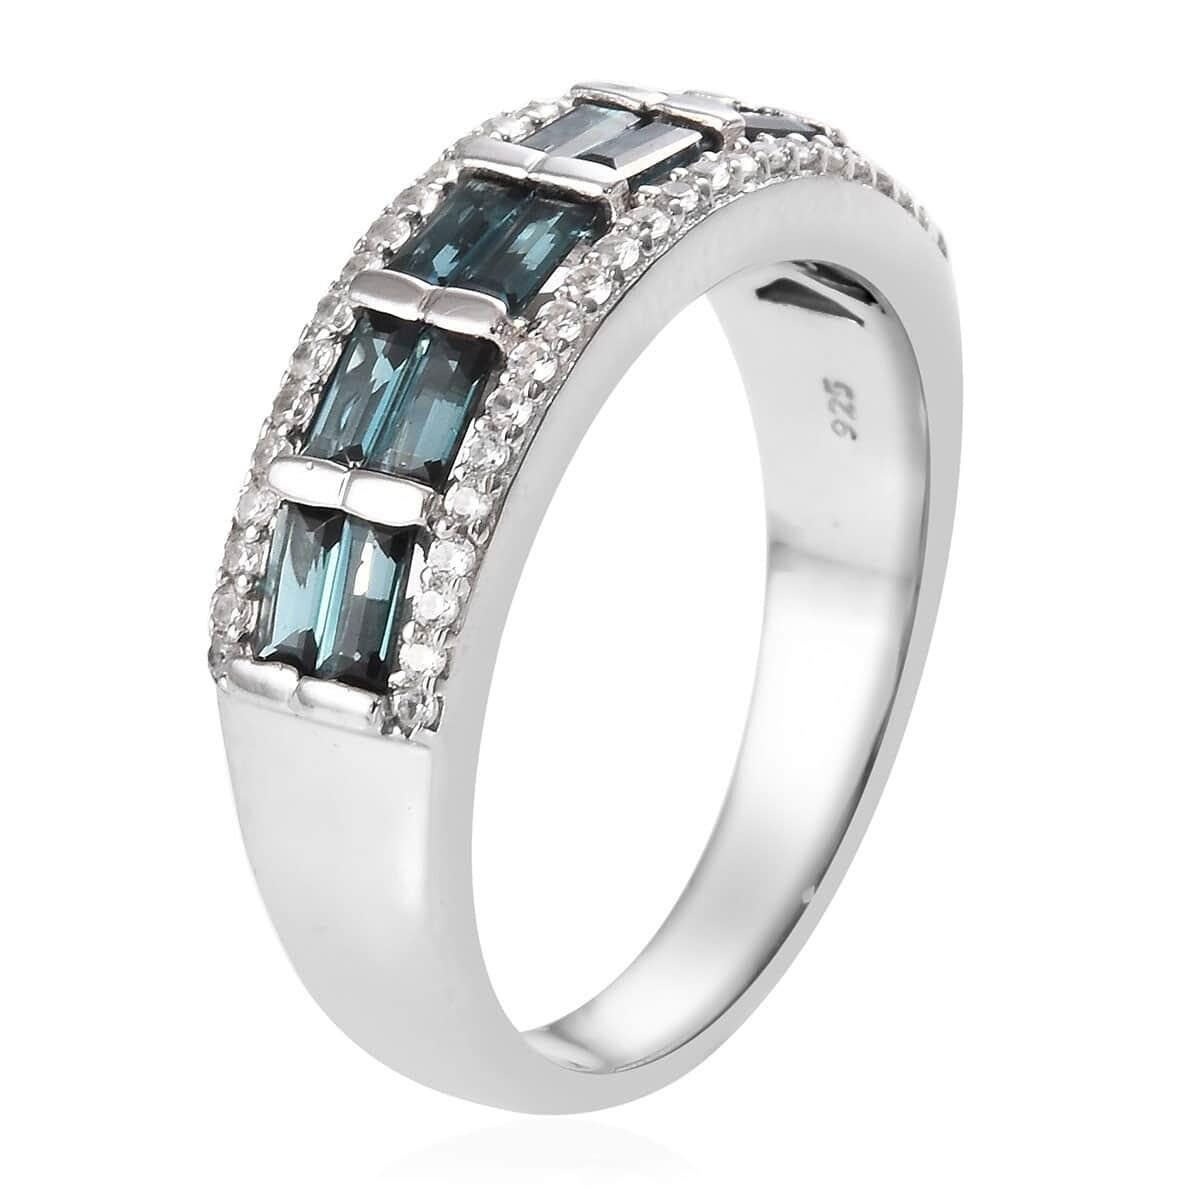 Monte Belo Indicolite, Zircon Ring in Platinum Over Sterling Silver (Size 8.0) (Avg. 7.20 g) 2.00 ctw